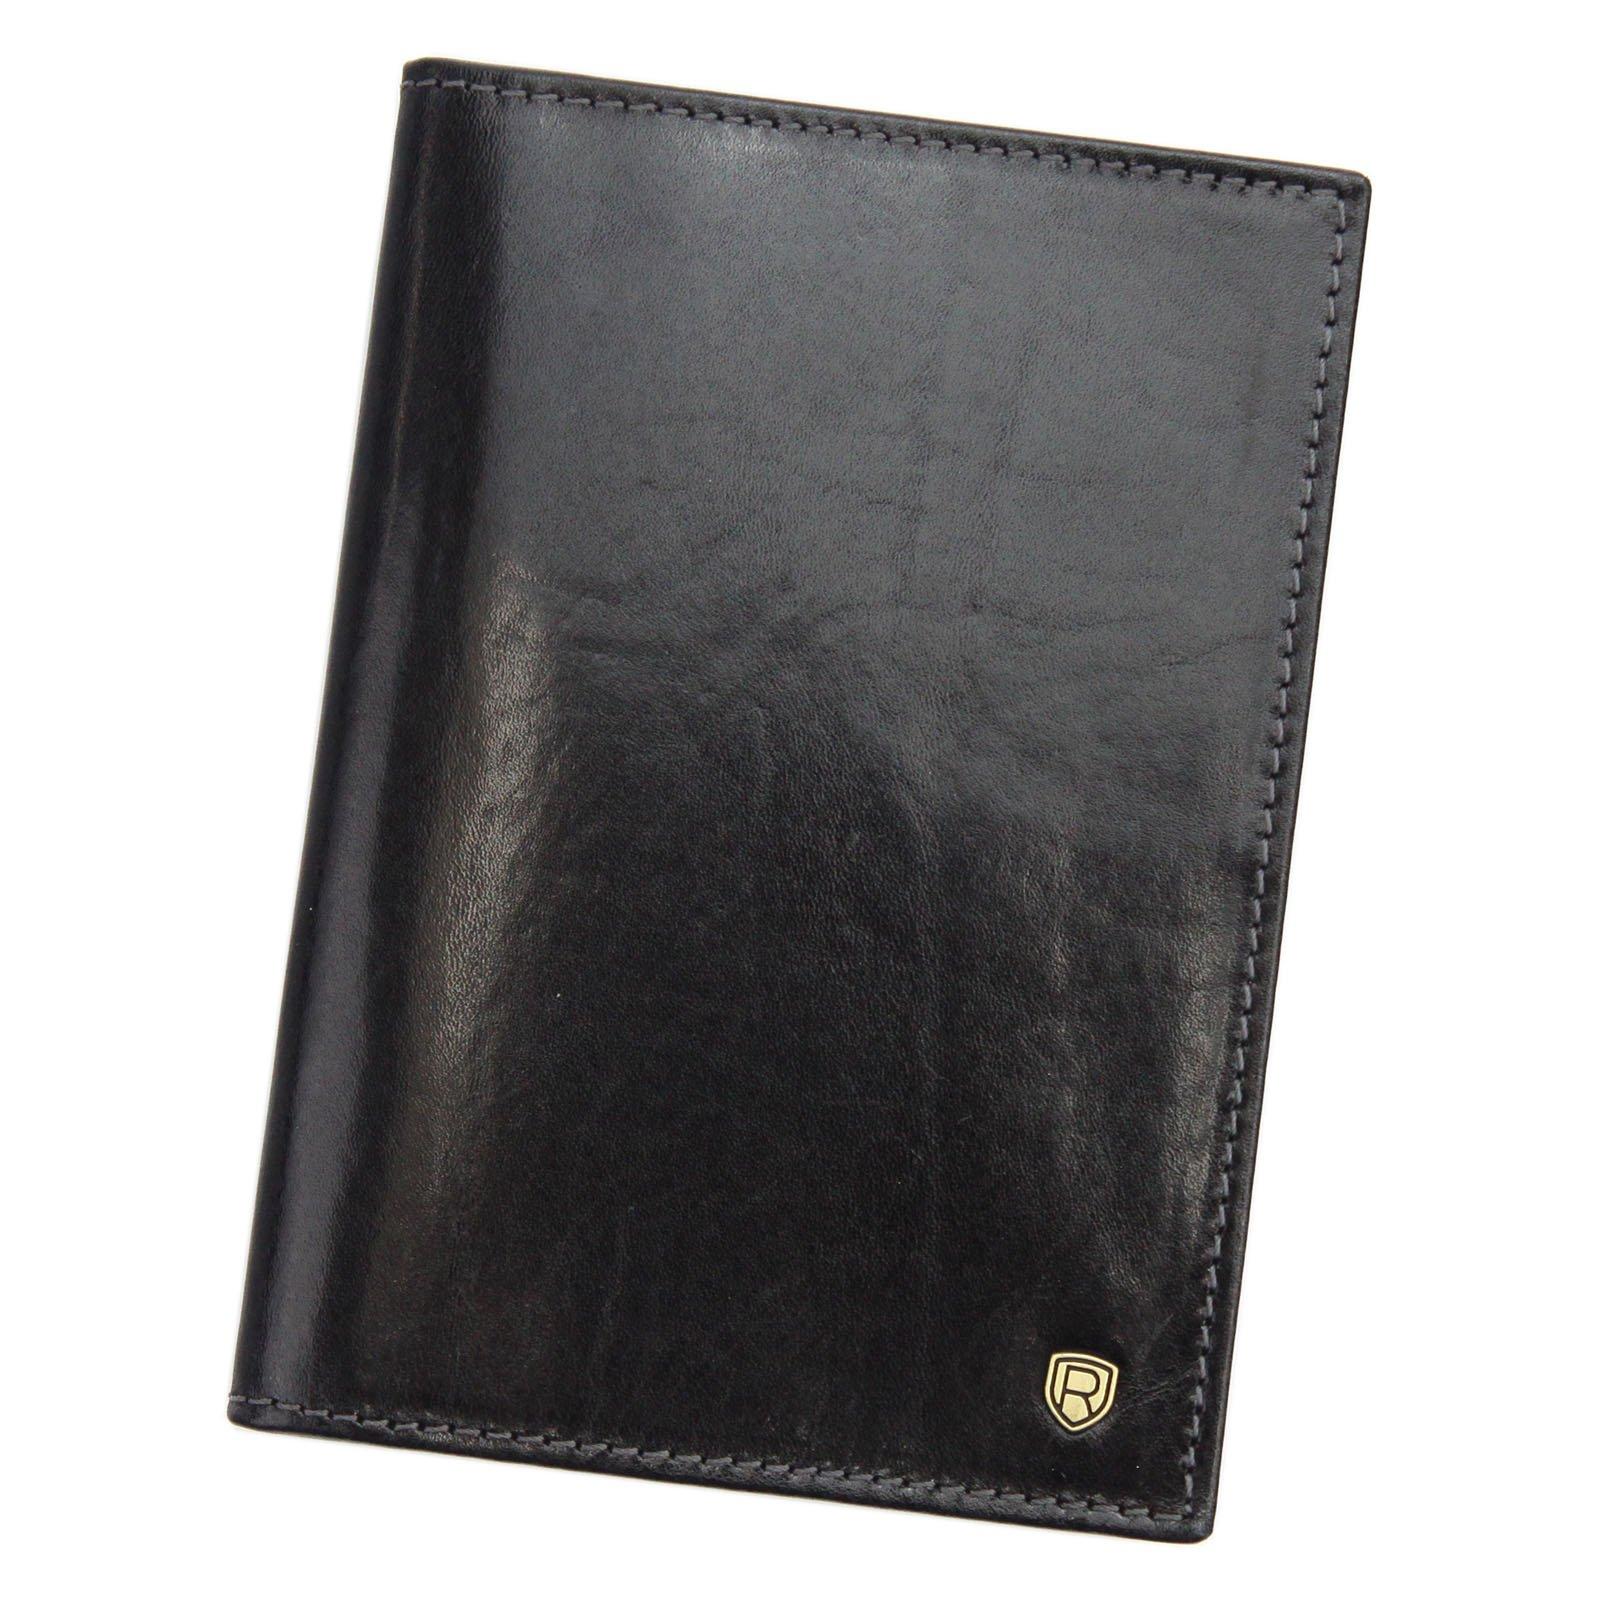 Puzdro na karty a doklady Rovicky PAL50-RVT